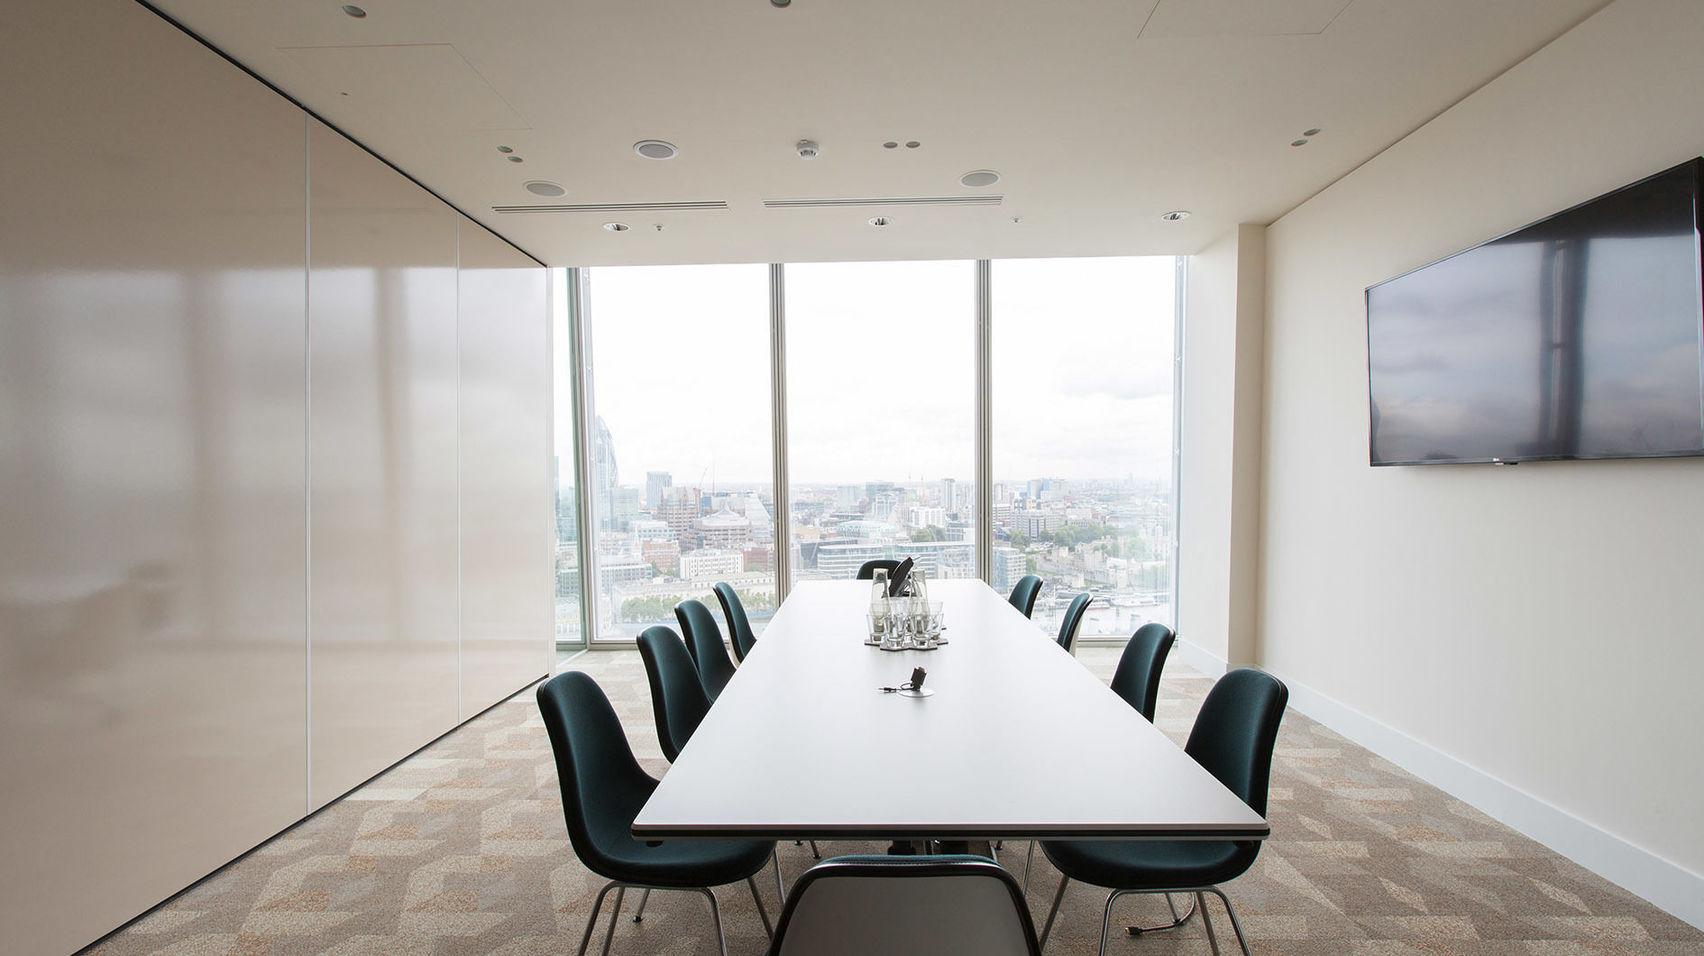 Meeting Room 4, TOG - 24/25 The Shard